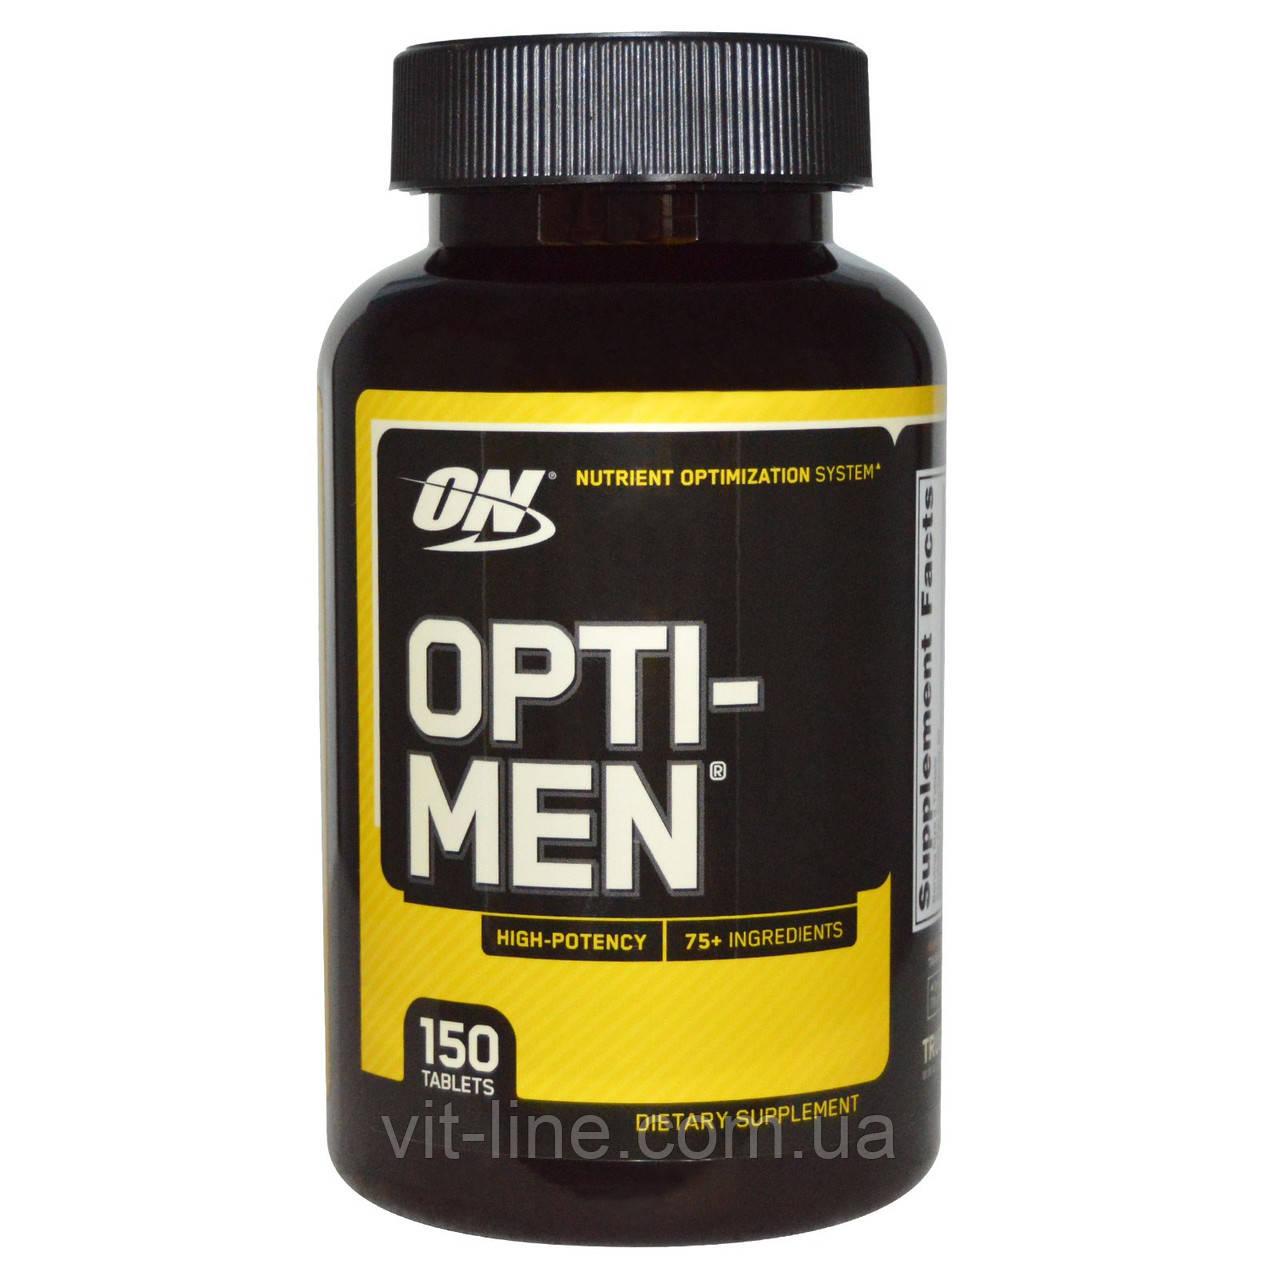 Opti-Men. Комплекс витаминов для мужчин от Optimum Nutrition, 150 таблеток